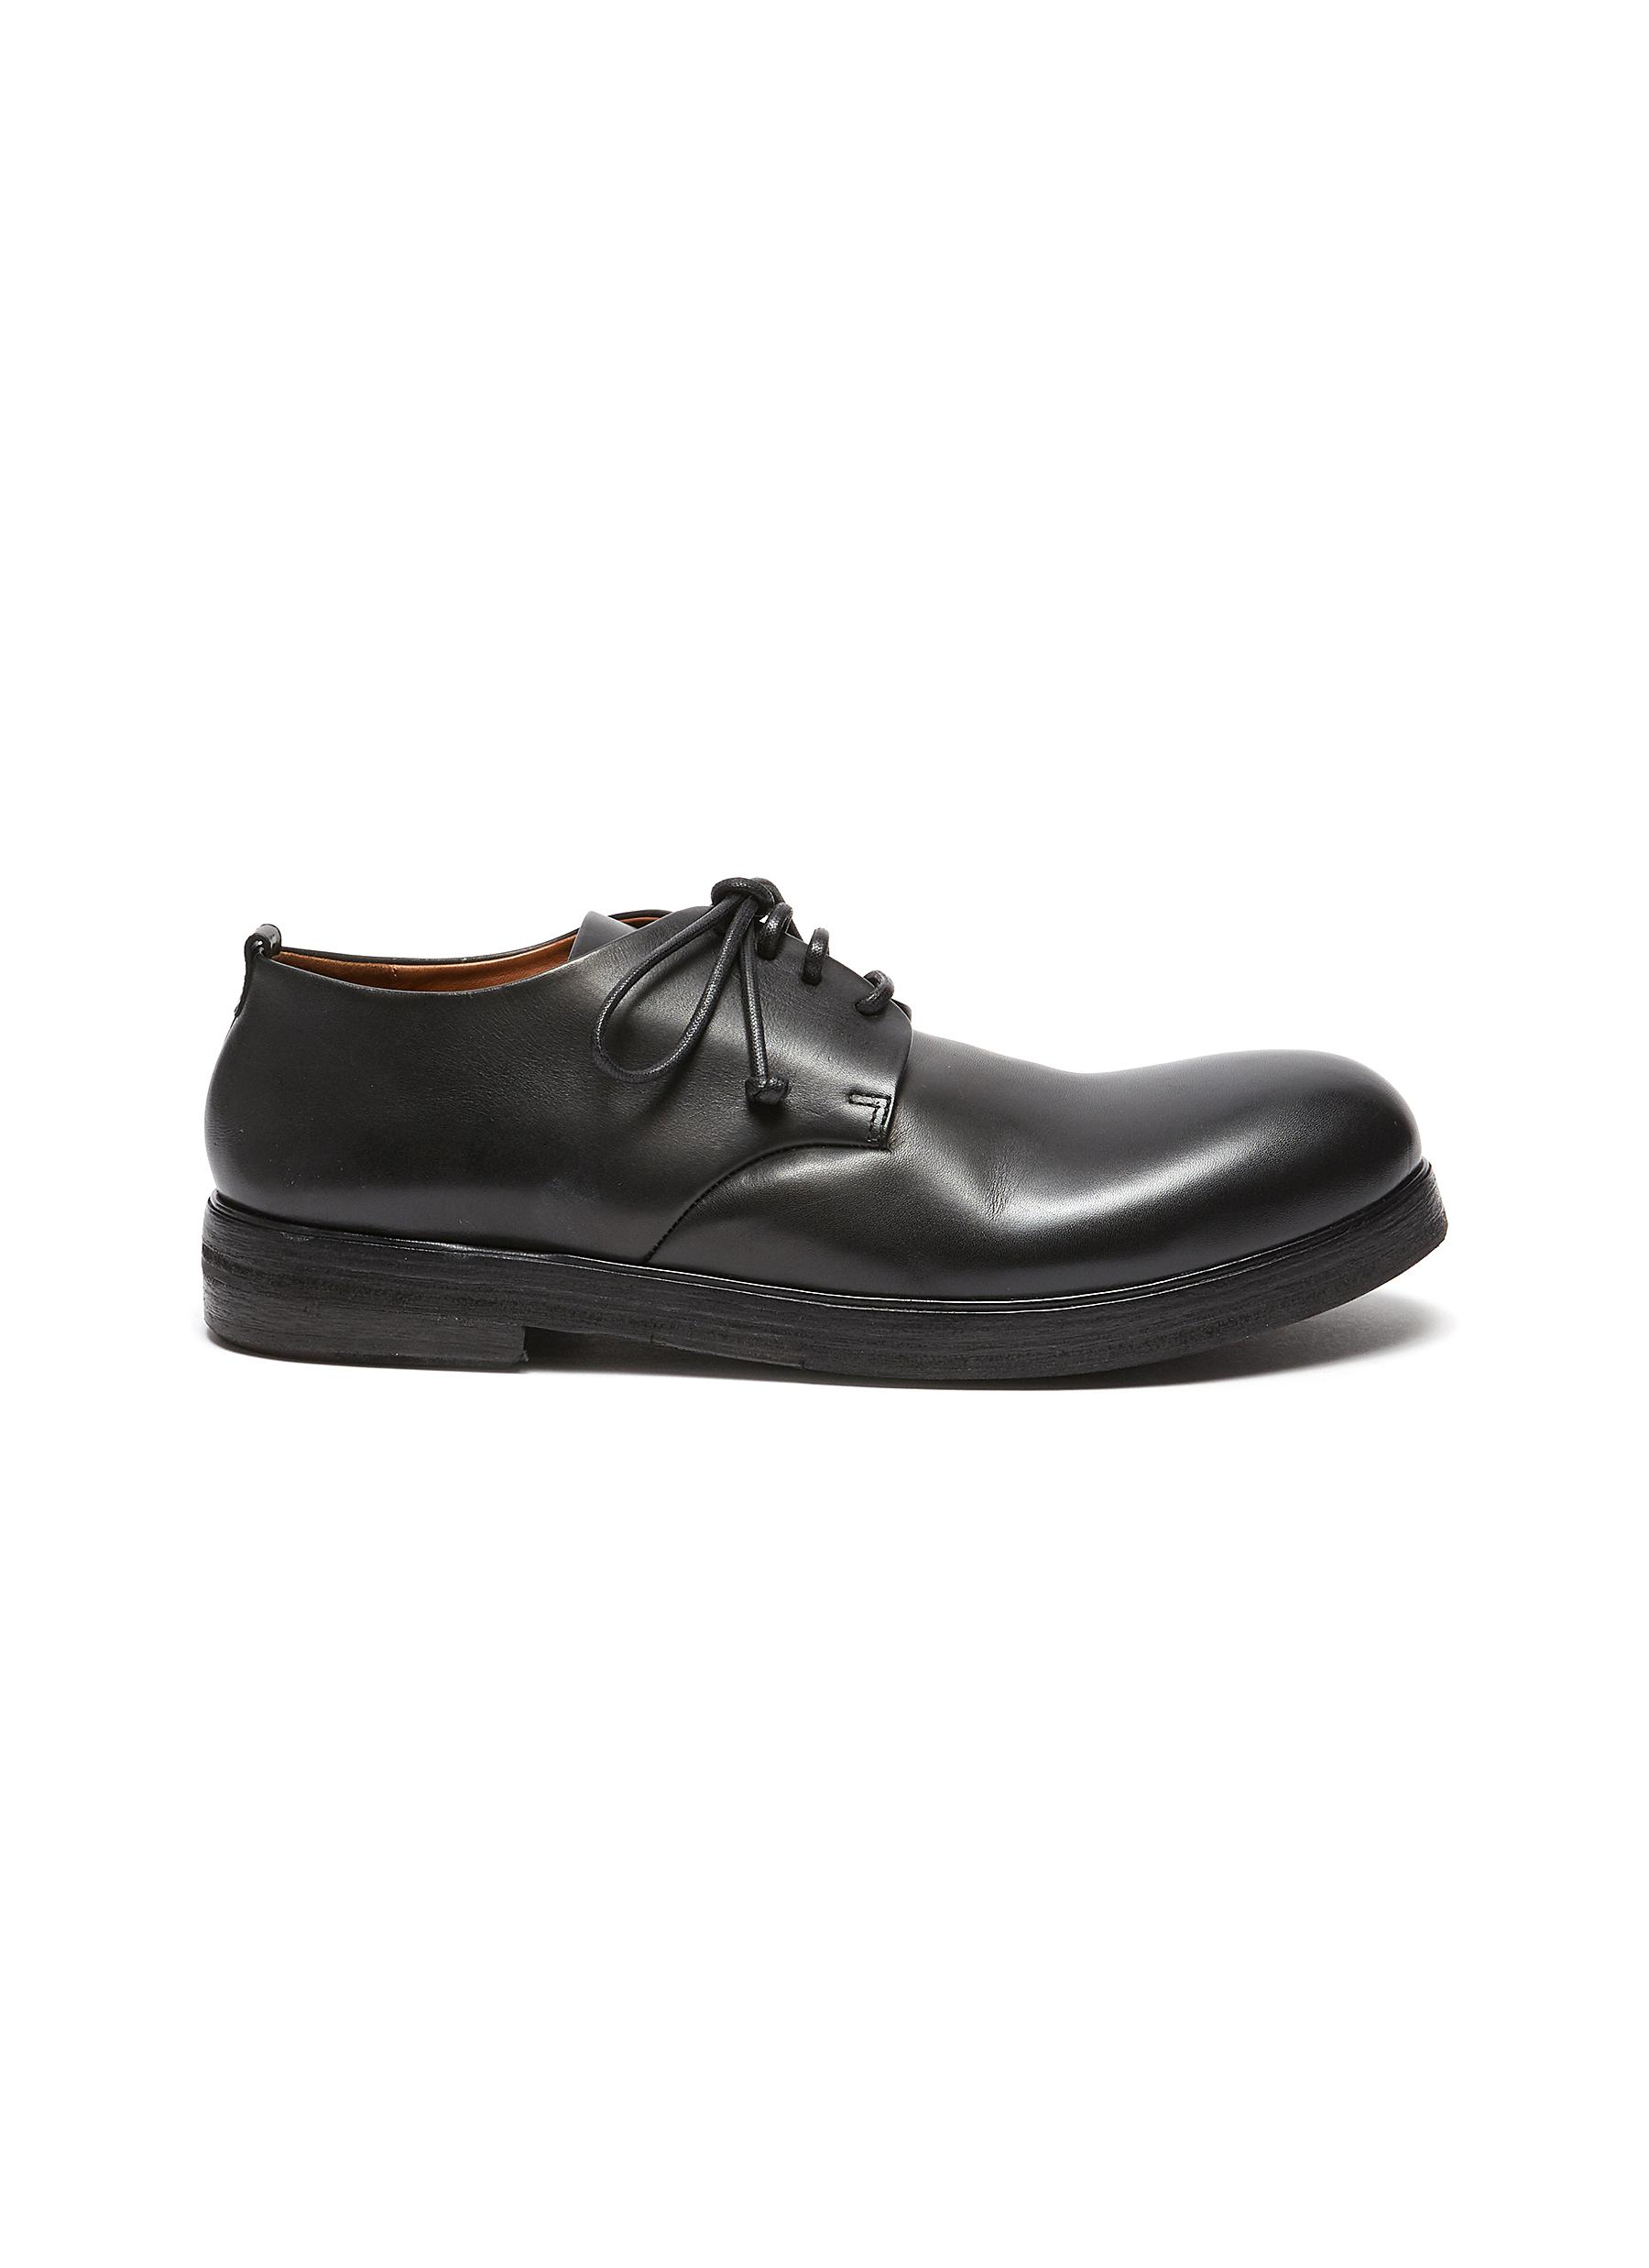 "Zucca Zeppa' Round Toe Leather Derby Shoes"" - MARSÈLL - Modalova"